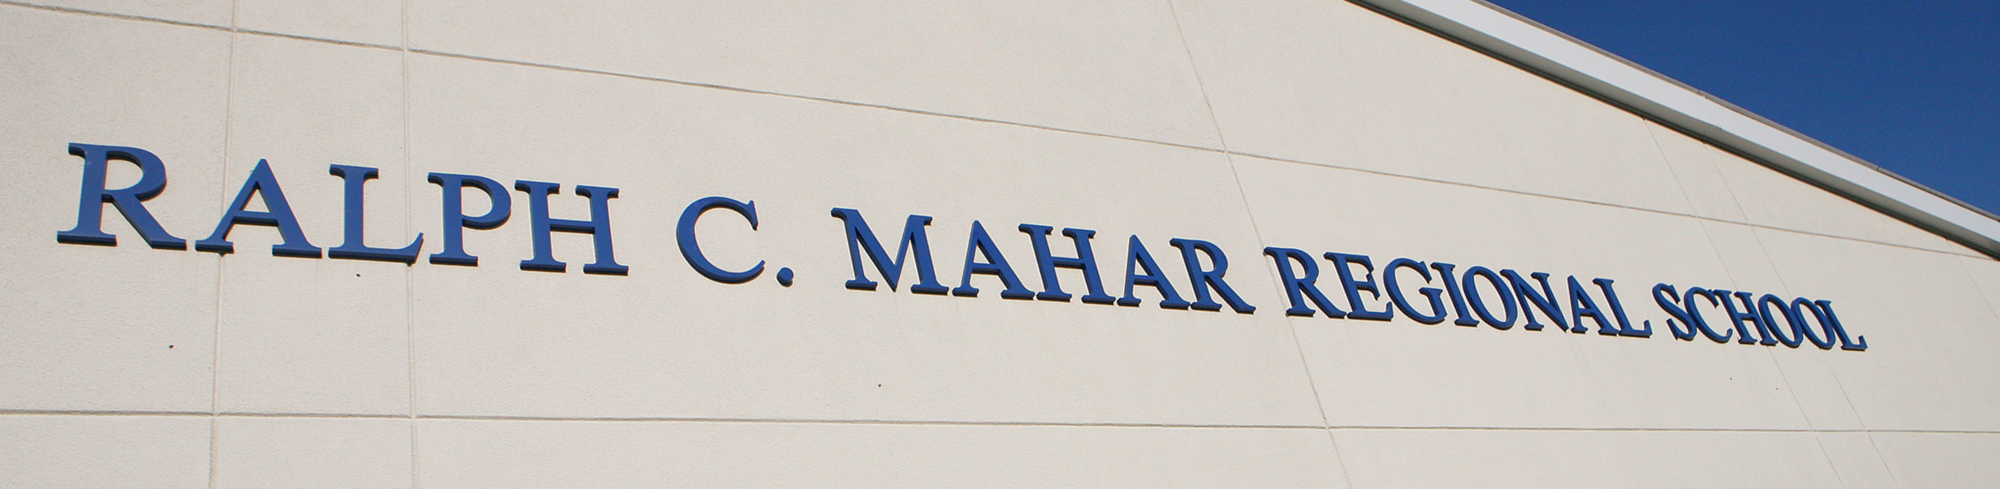 Ralph C Mahar School building